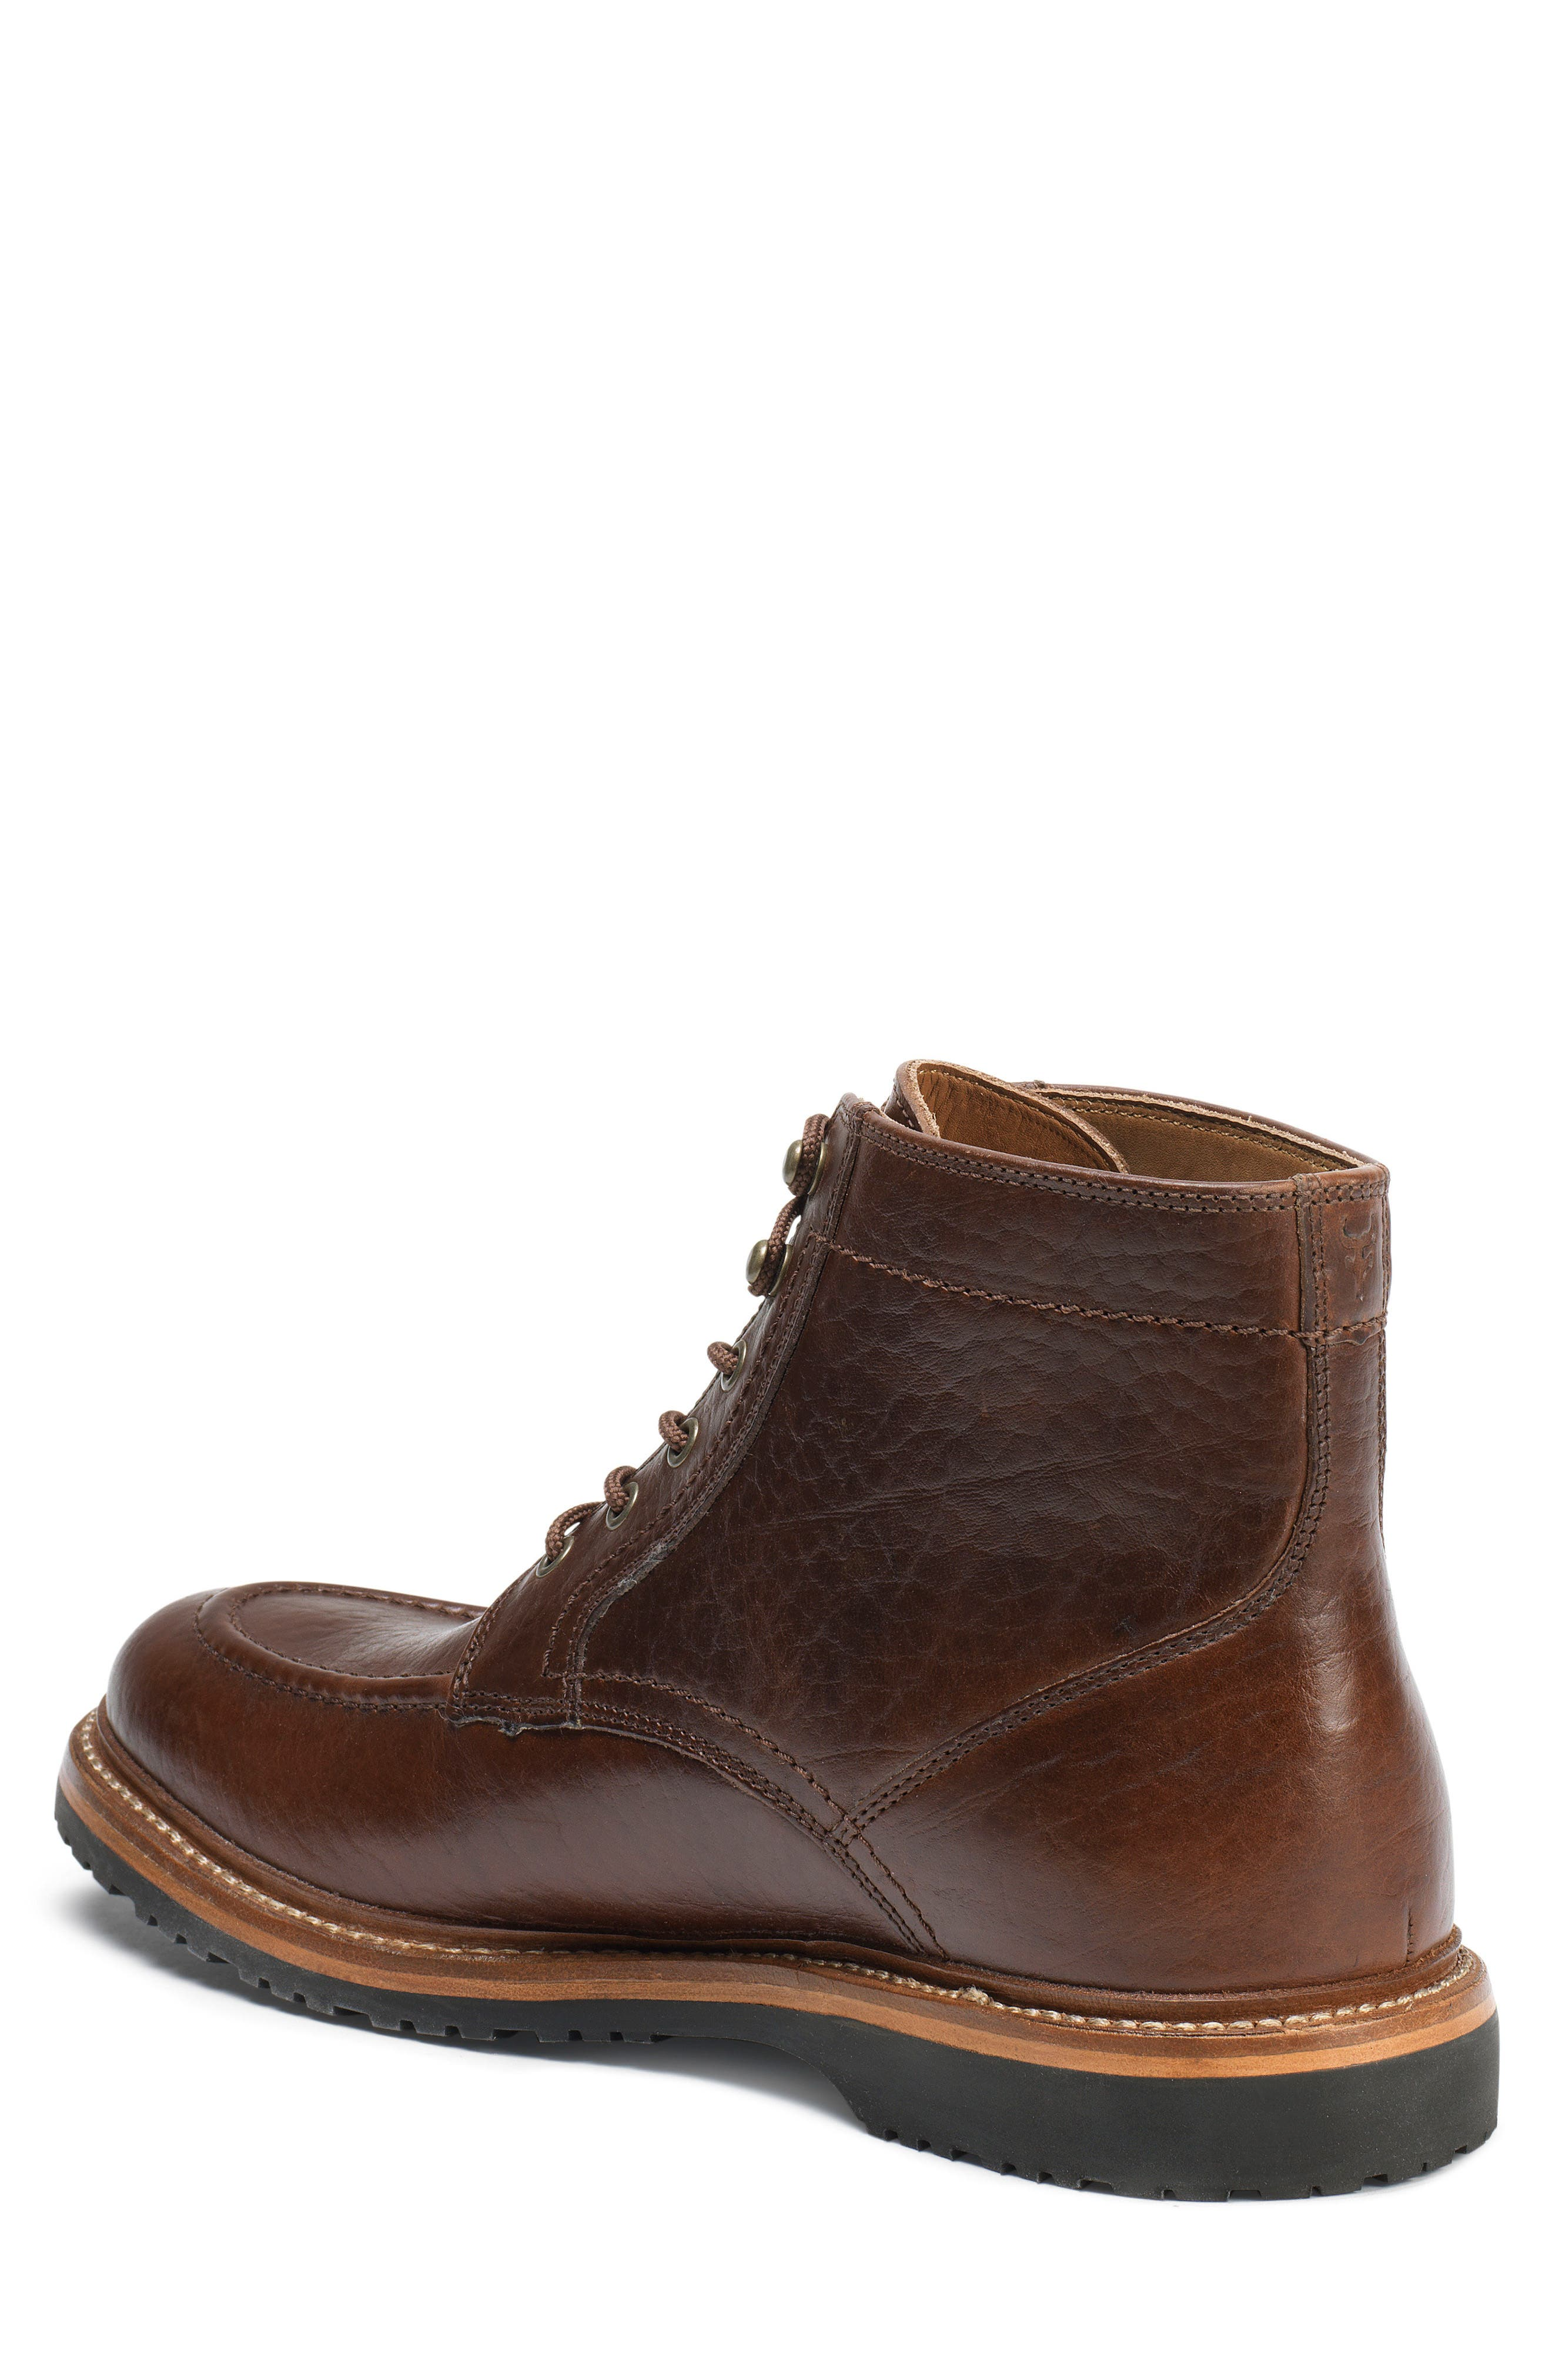 Alternate Image 2  - Trask 'Andrew Mid' Apron Toe Boot (Men)